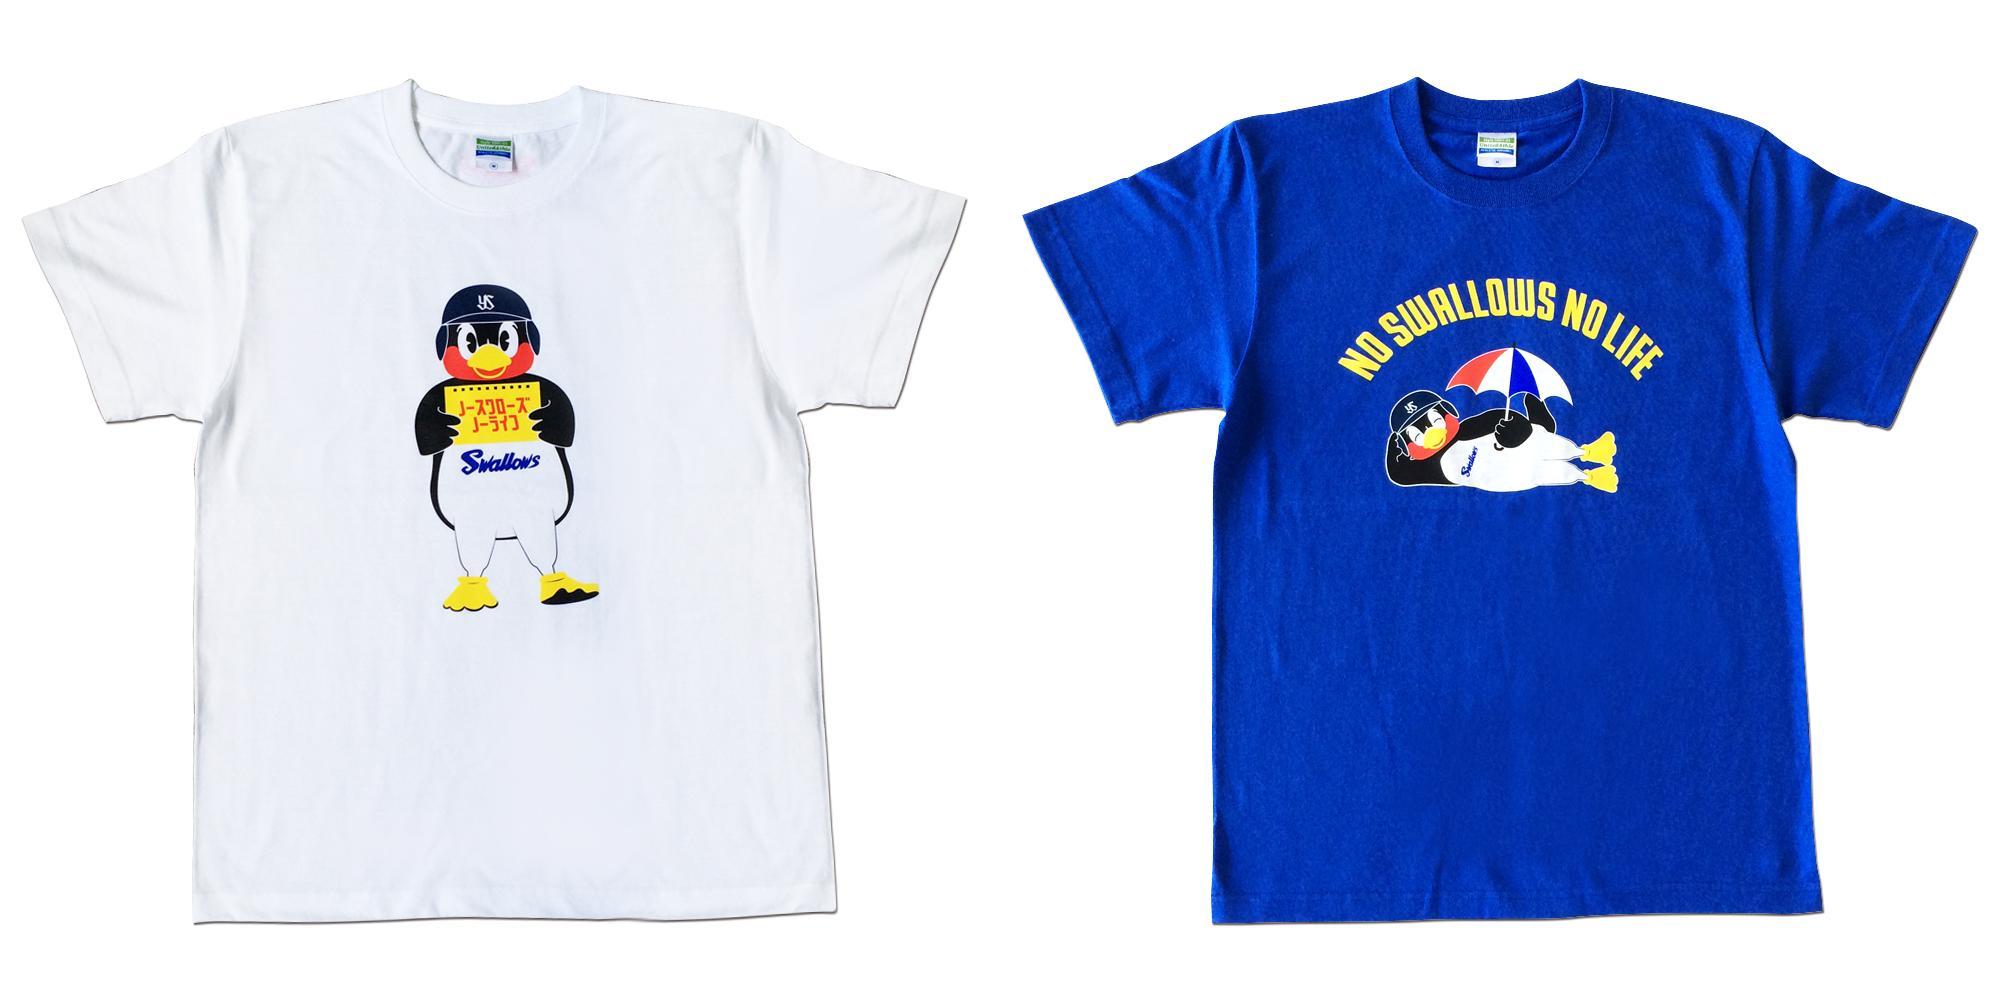 NO SWALLOWS, NO LIFE.Tシャツ